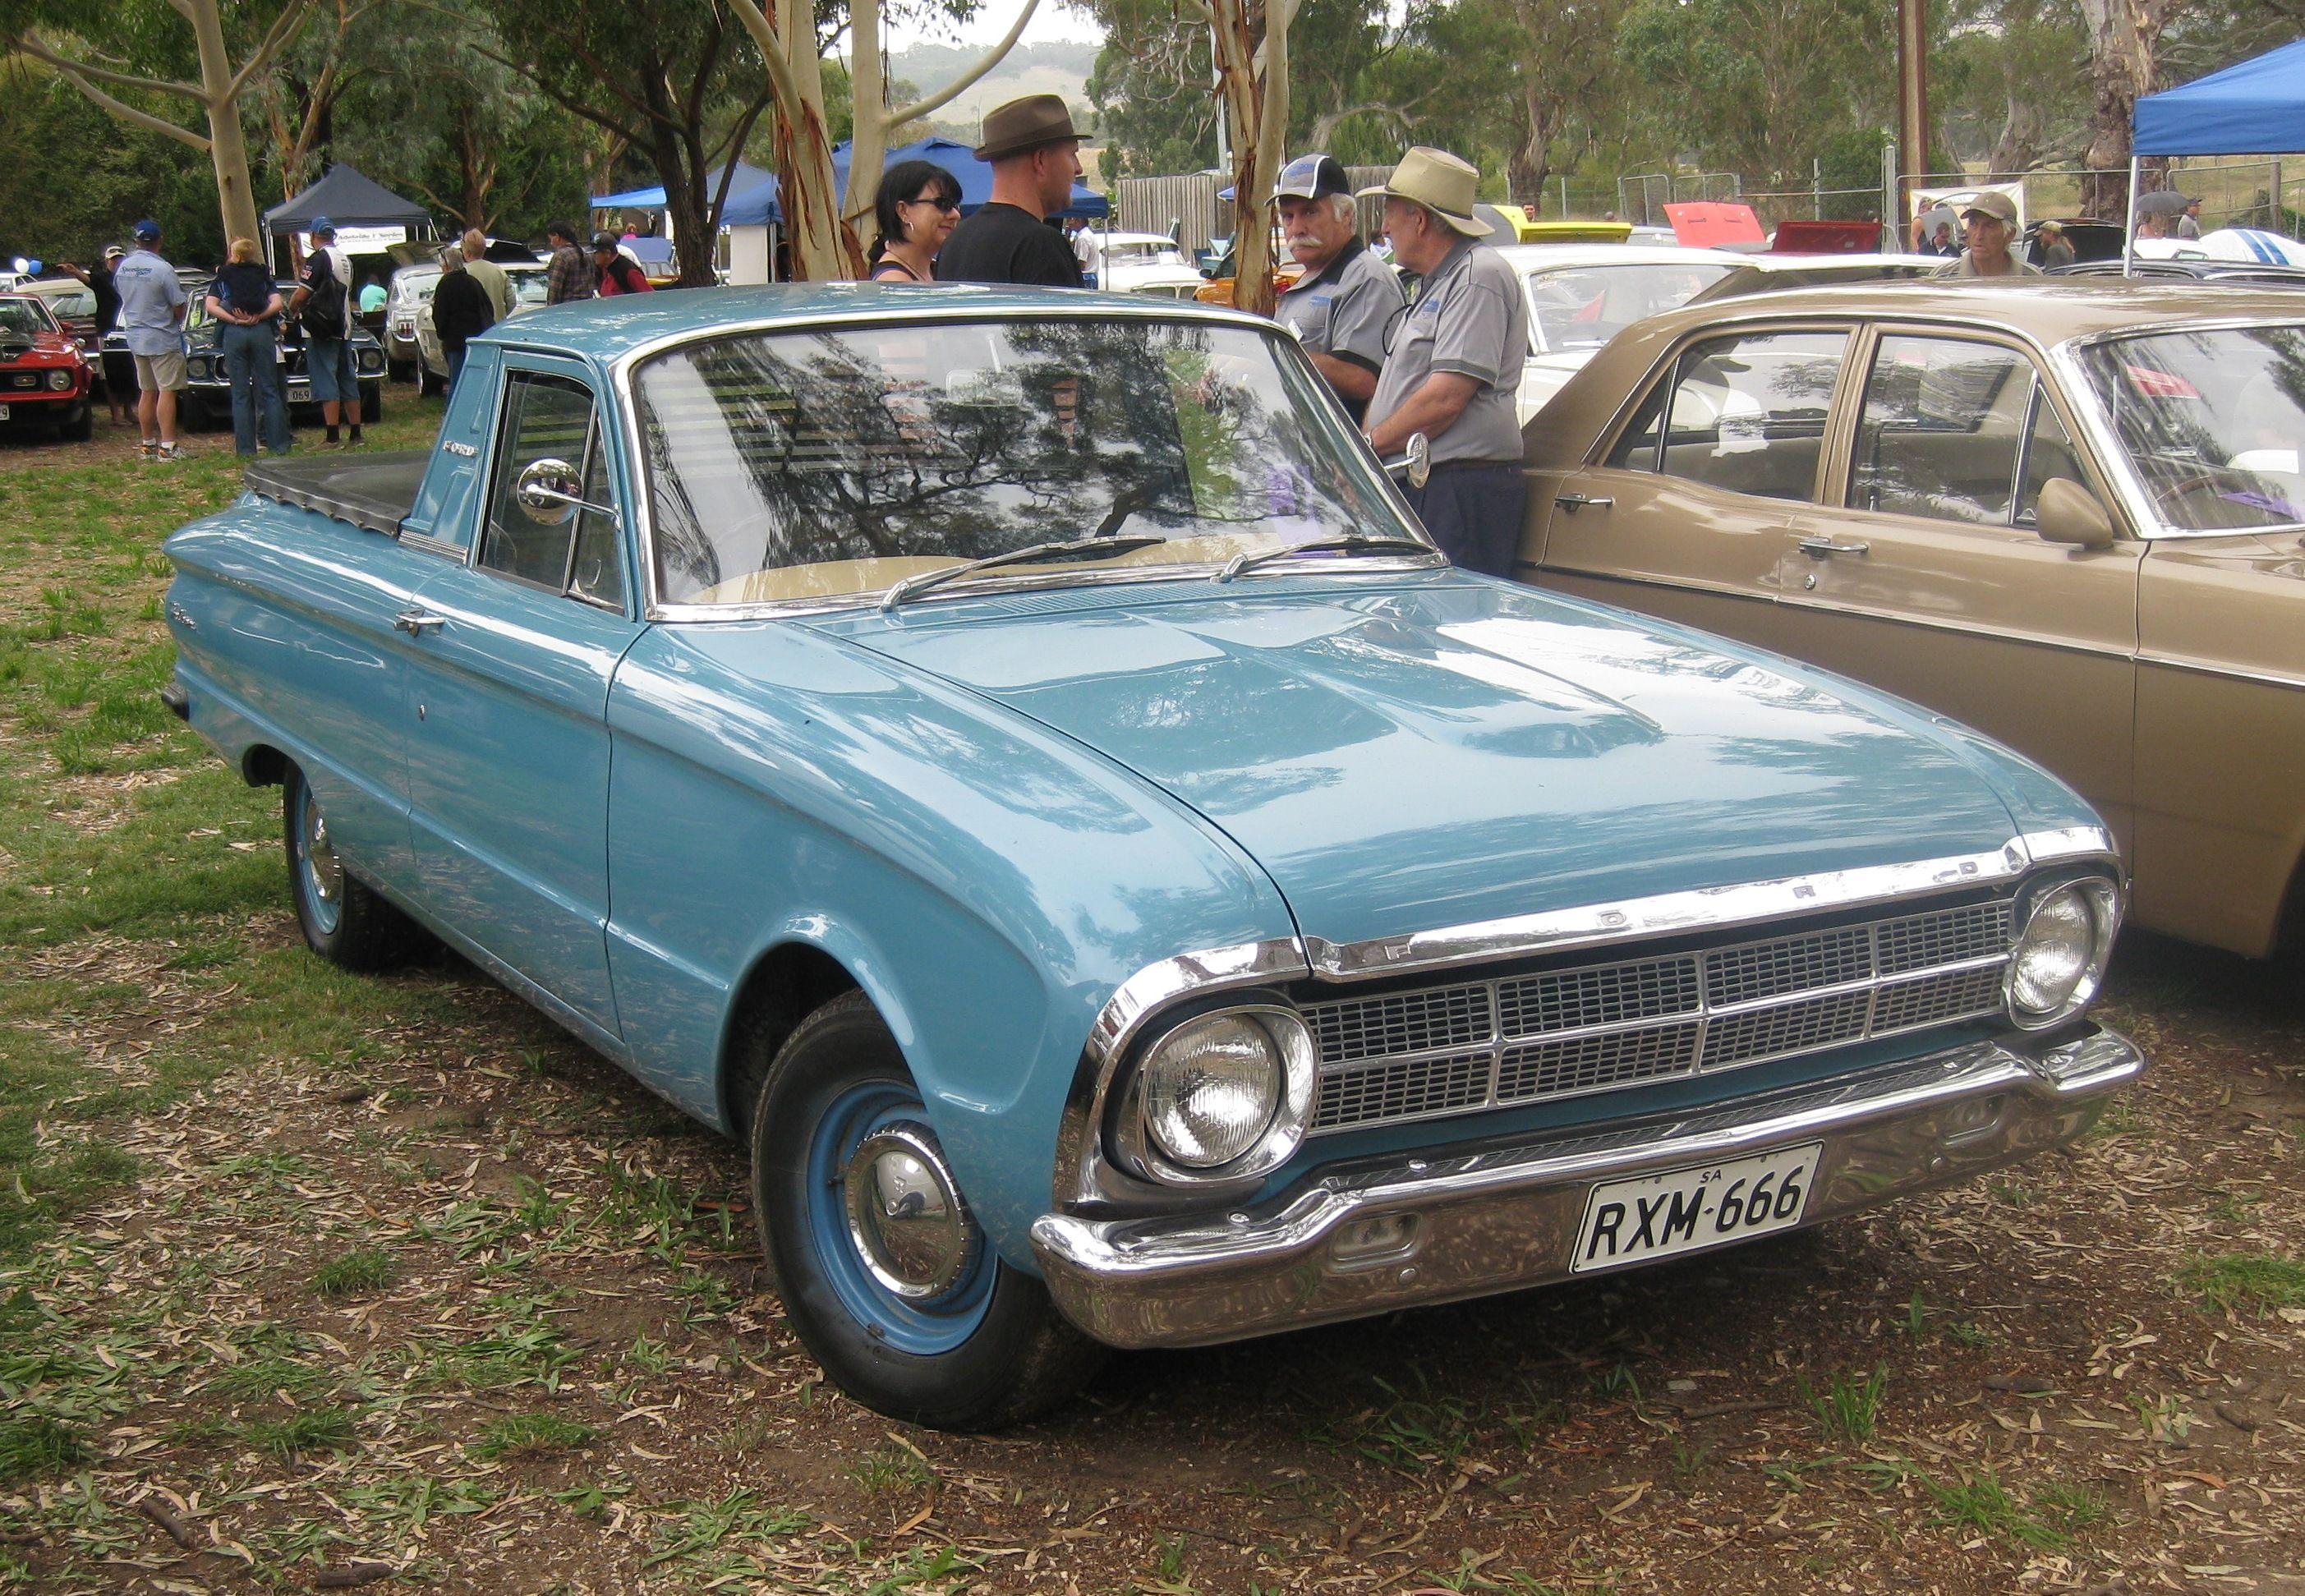 Ford Falcon Xl Ute Images 7 From 10 Ford Falcon Ford Falcon Australia Australian Cars